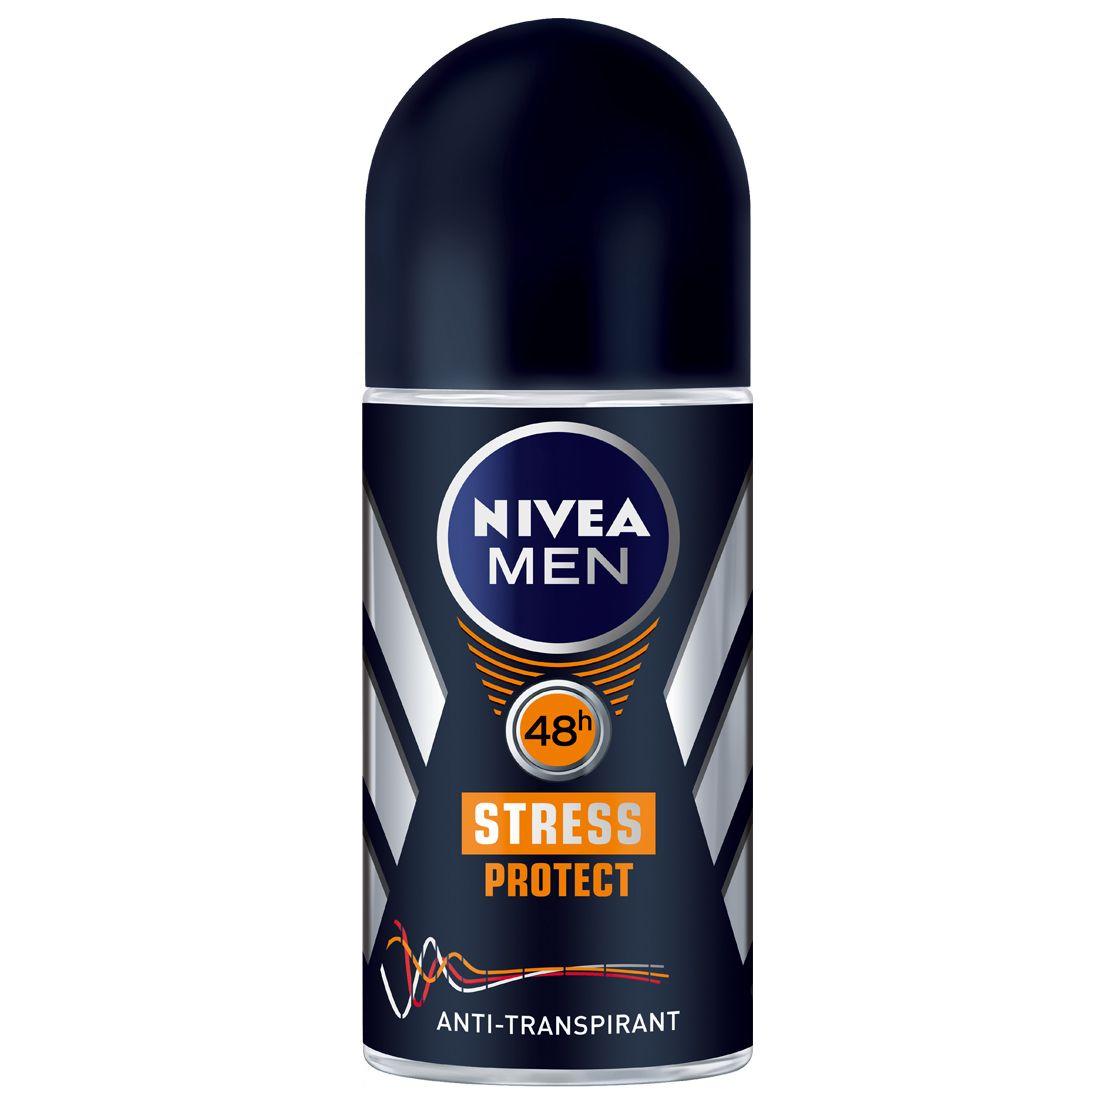 Besonders Starker Schutz Herzklopfen Pinterest Nivea Men Deodorant Dry Impact Roll On 50ml Stress Protect Niveamen Stressprotect